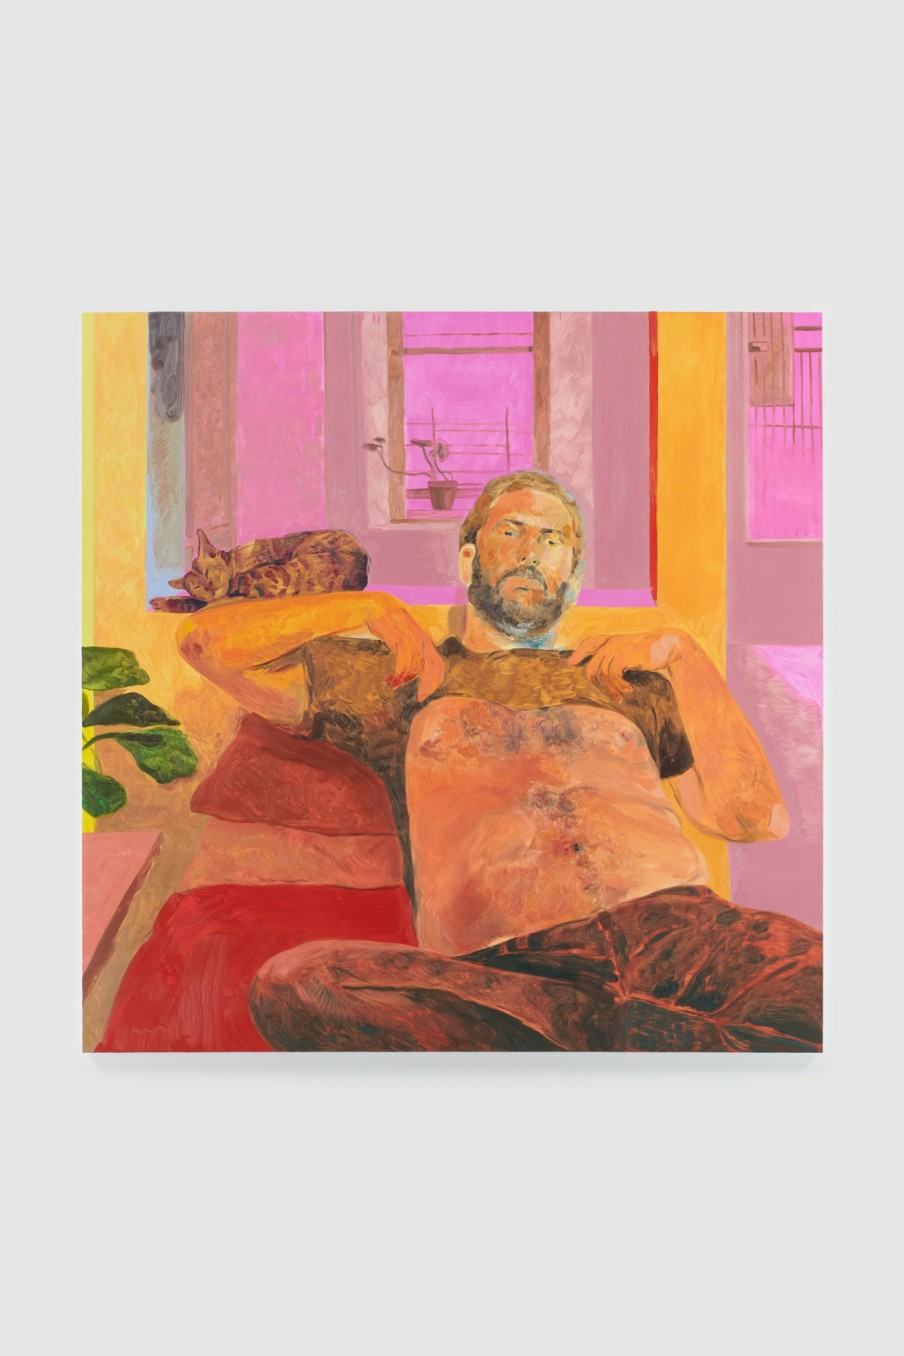 Anthony Cudahy Josh in warm light, 2021 Oil on canvas 152.4 x 152.4 cm 60 x 60 in